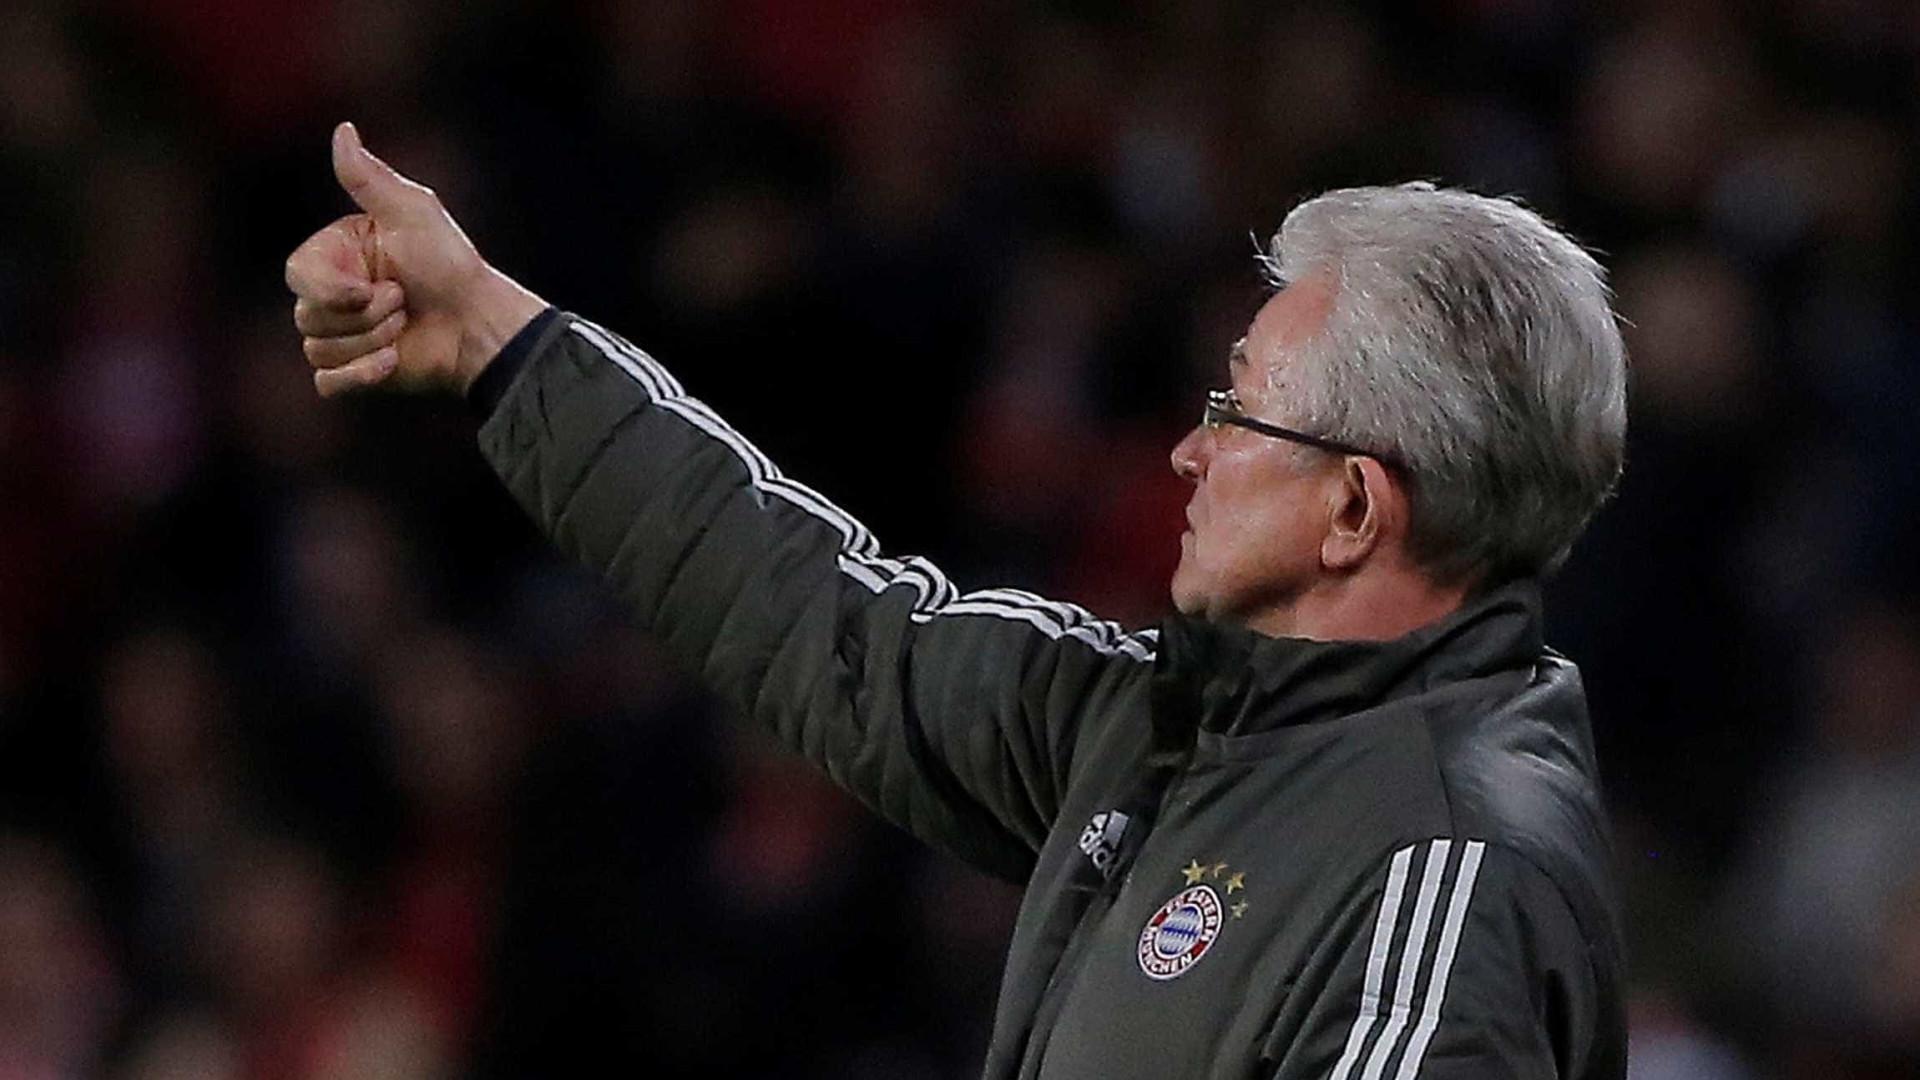 Bundesliga: Bayern de Munique conquista sexto título apesar de autogolo